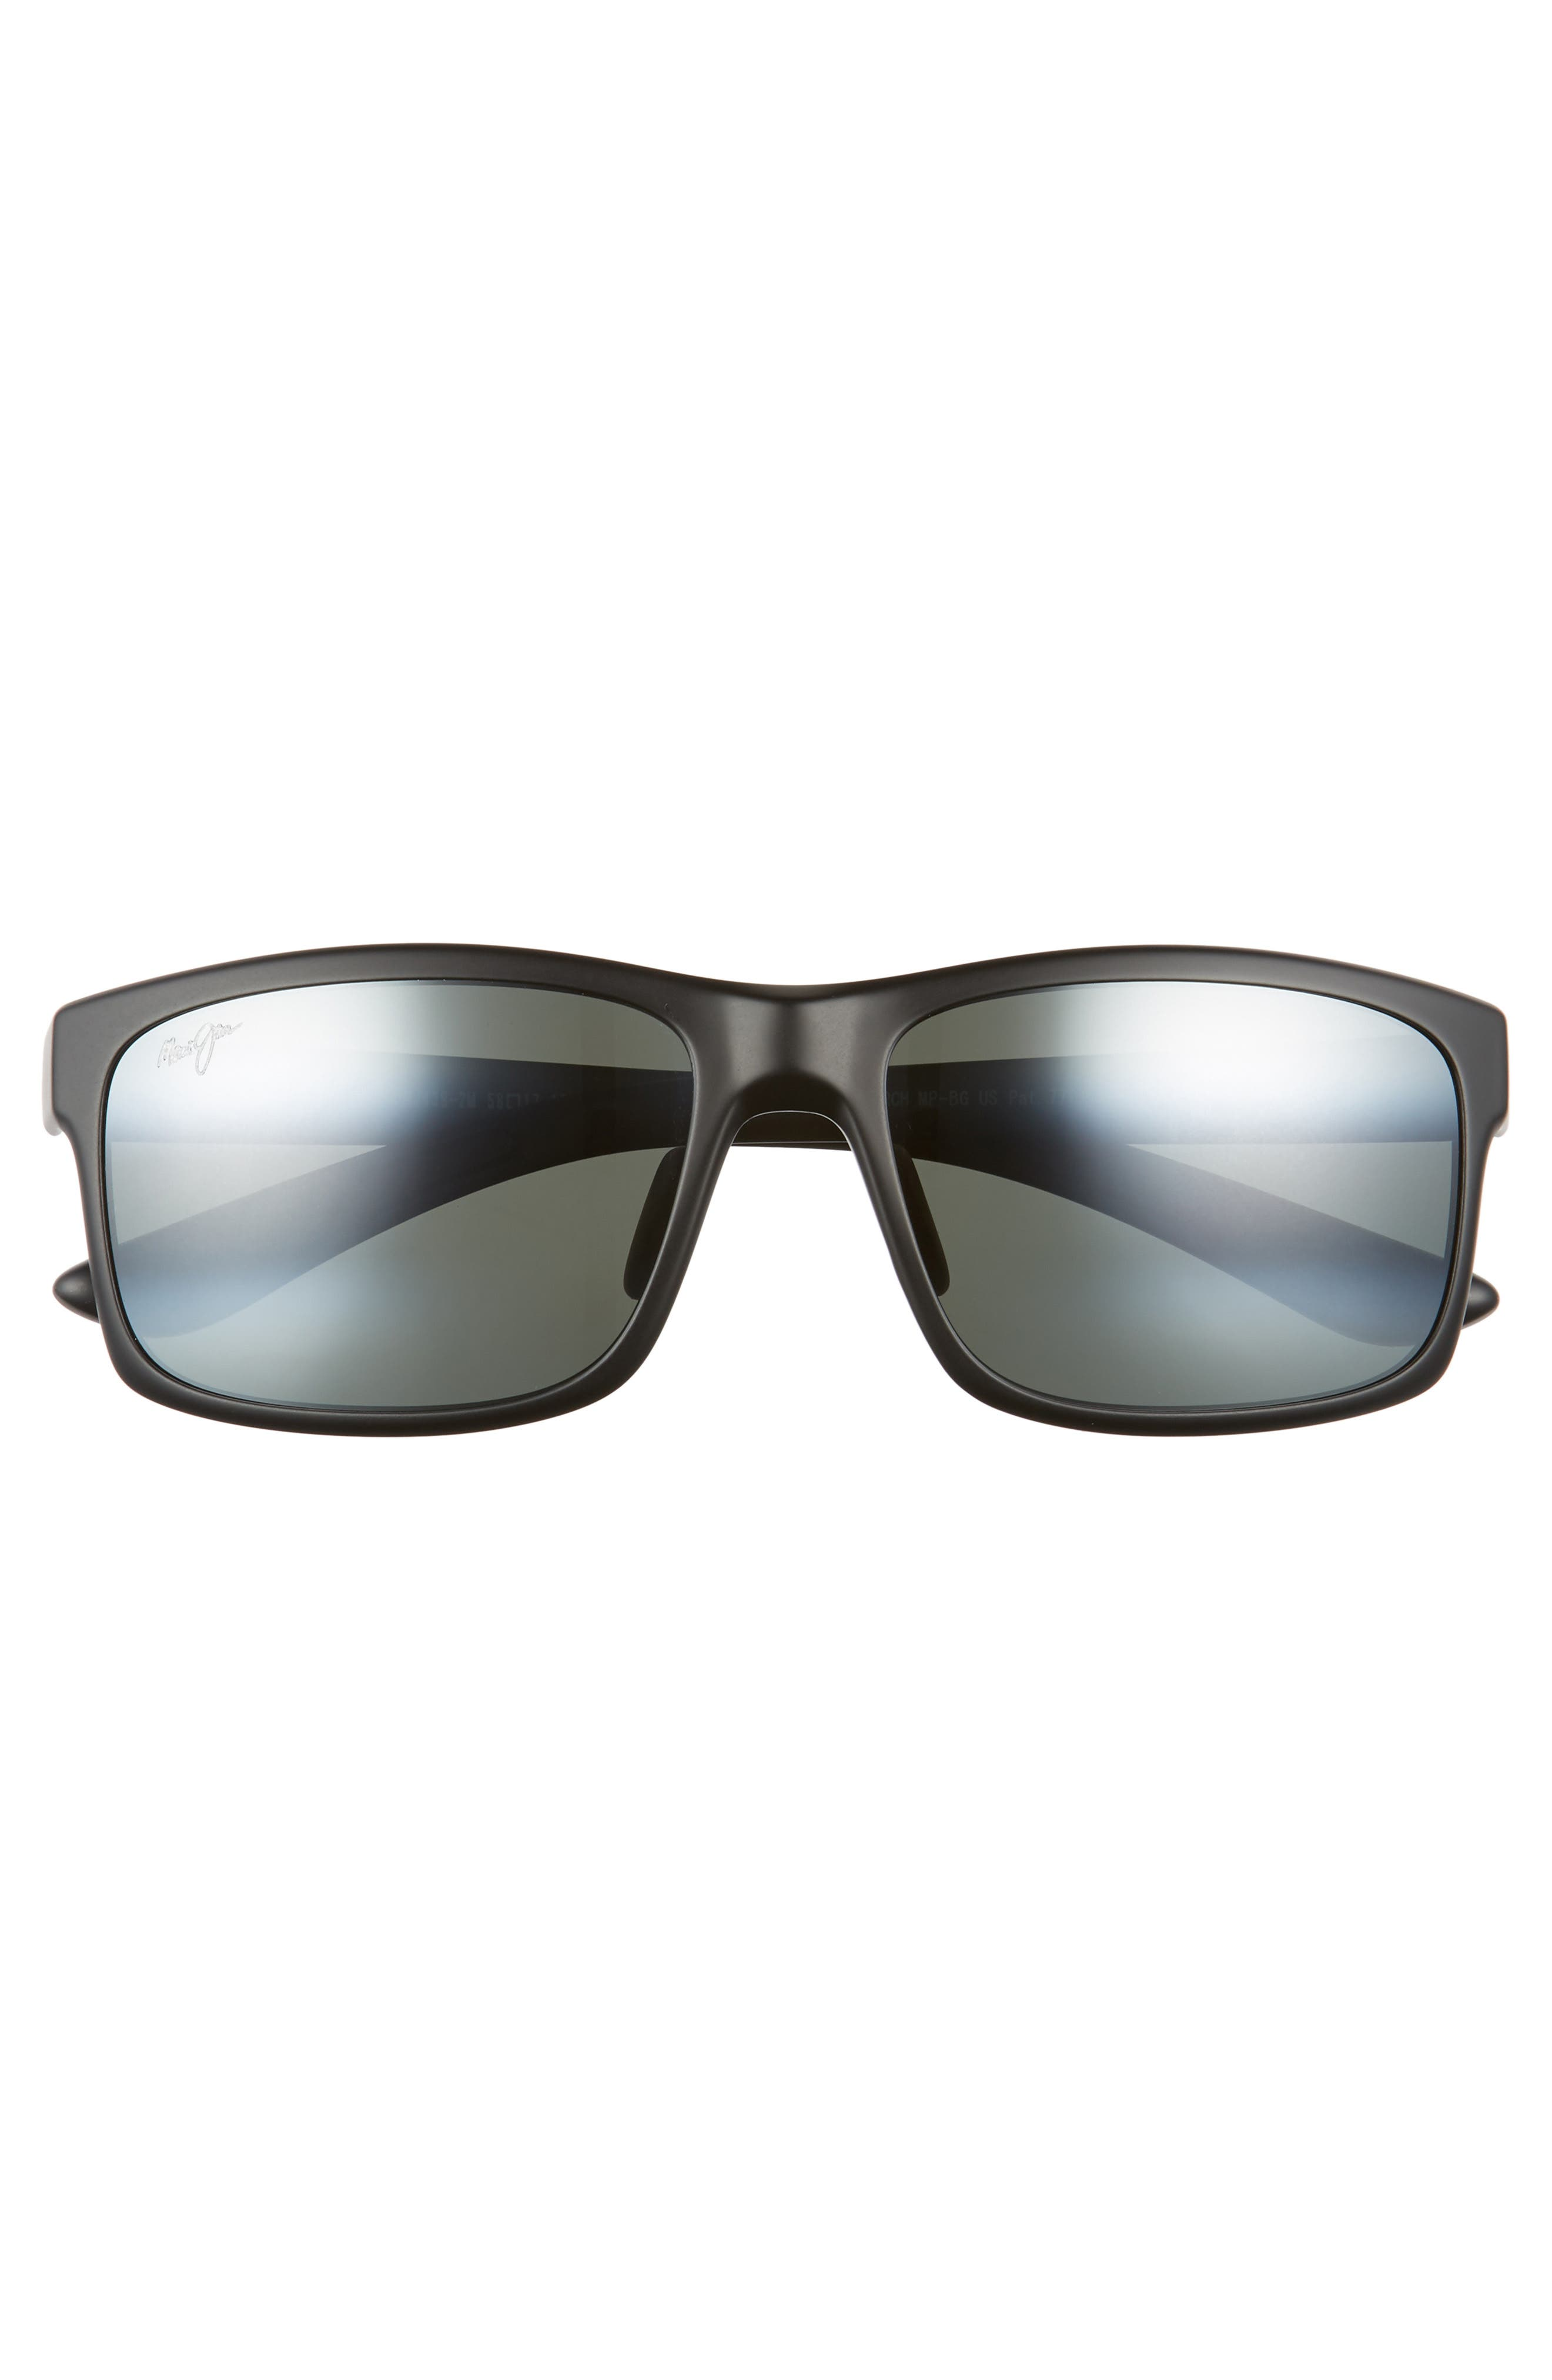 Pokowai Arch 58mm Polarized Sunglasses,                             Alternate thumbnail 2, color,                             BLACK MATTE/ NEUTRAL GREY